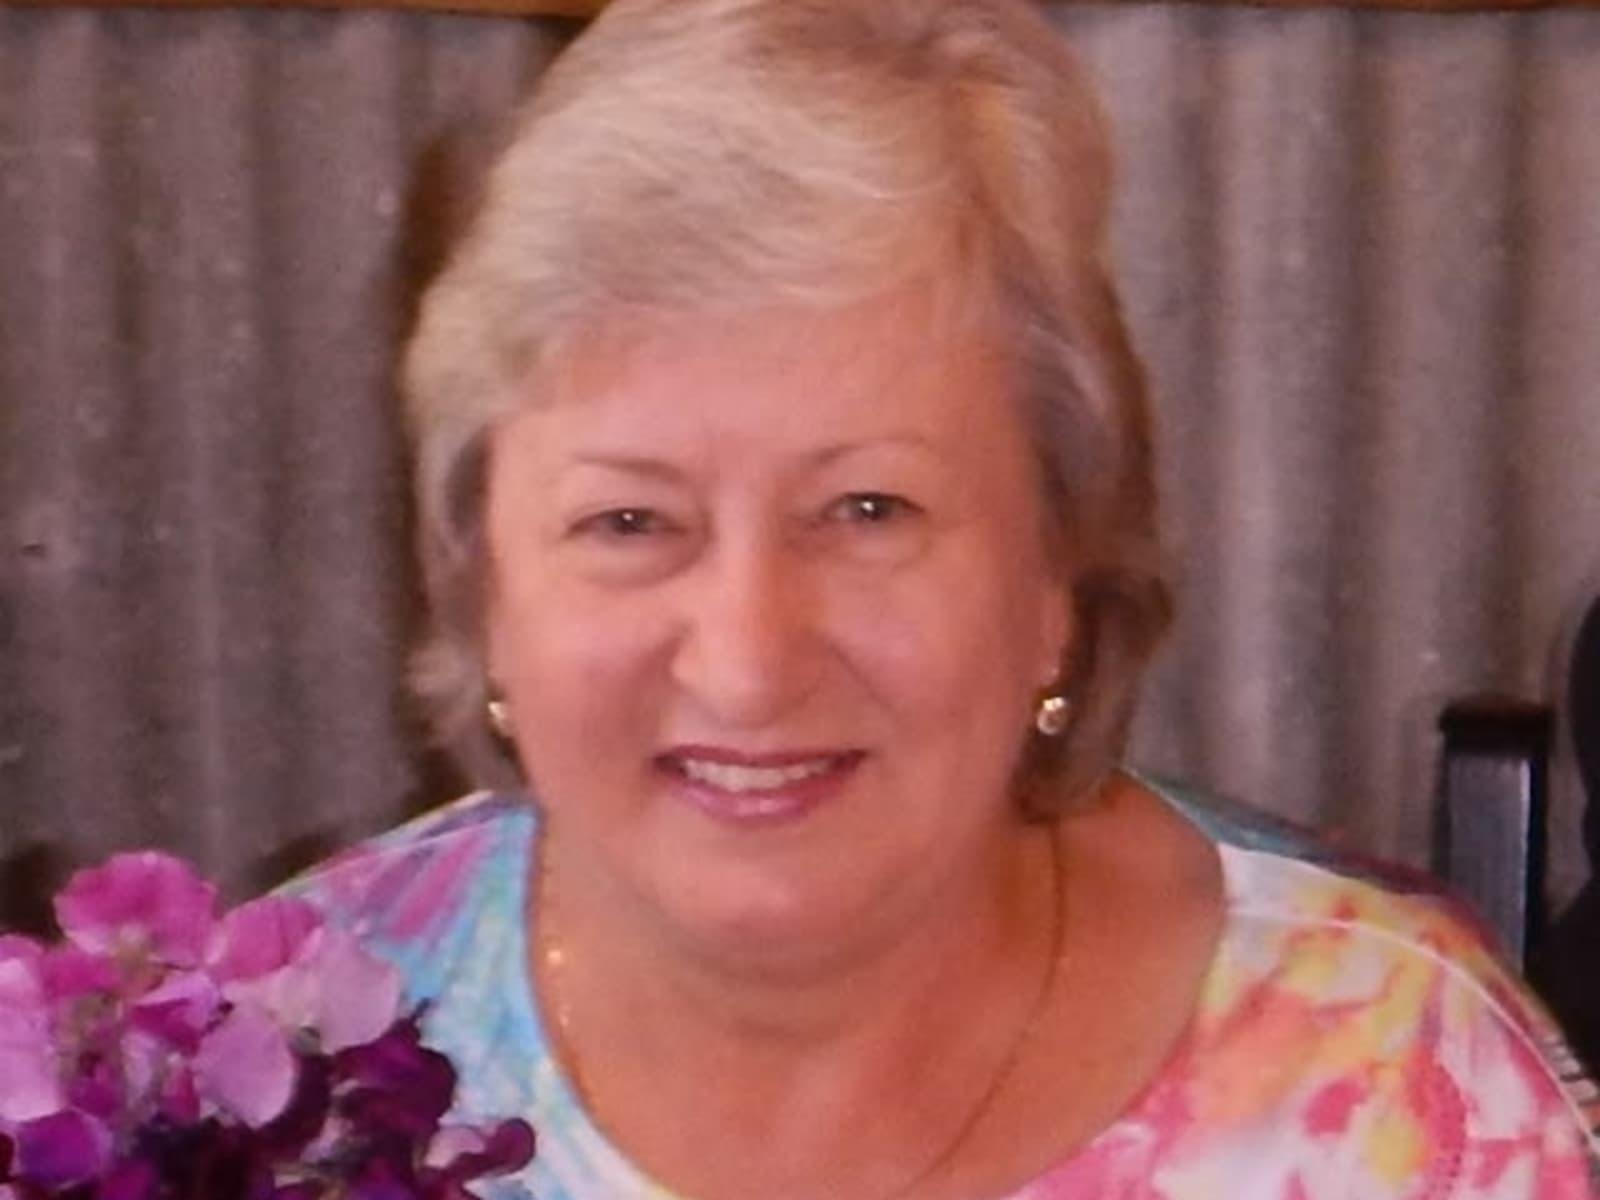 Sue from Wyndham, New South Wales, Australia